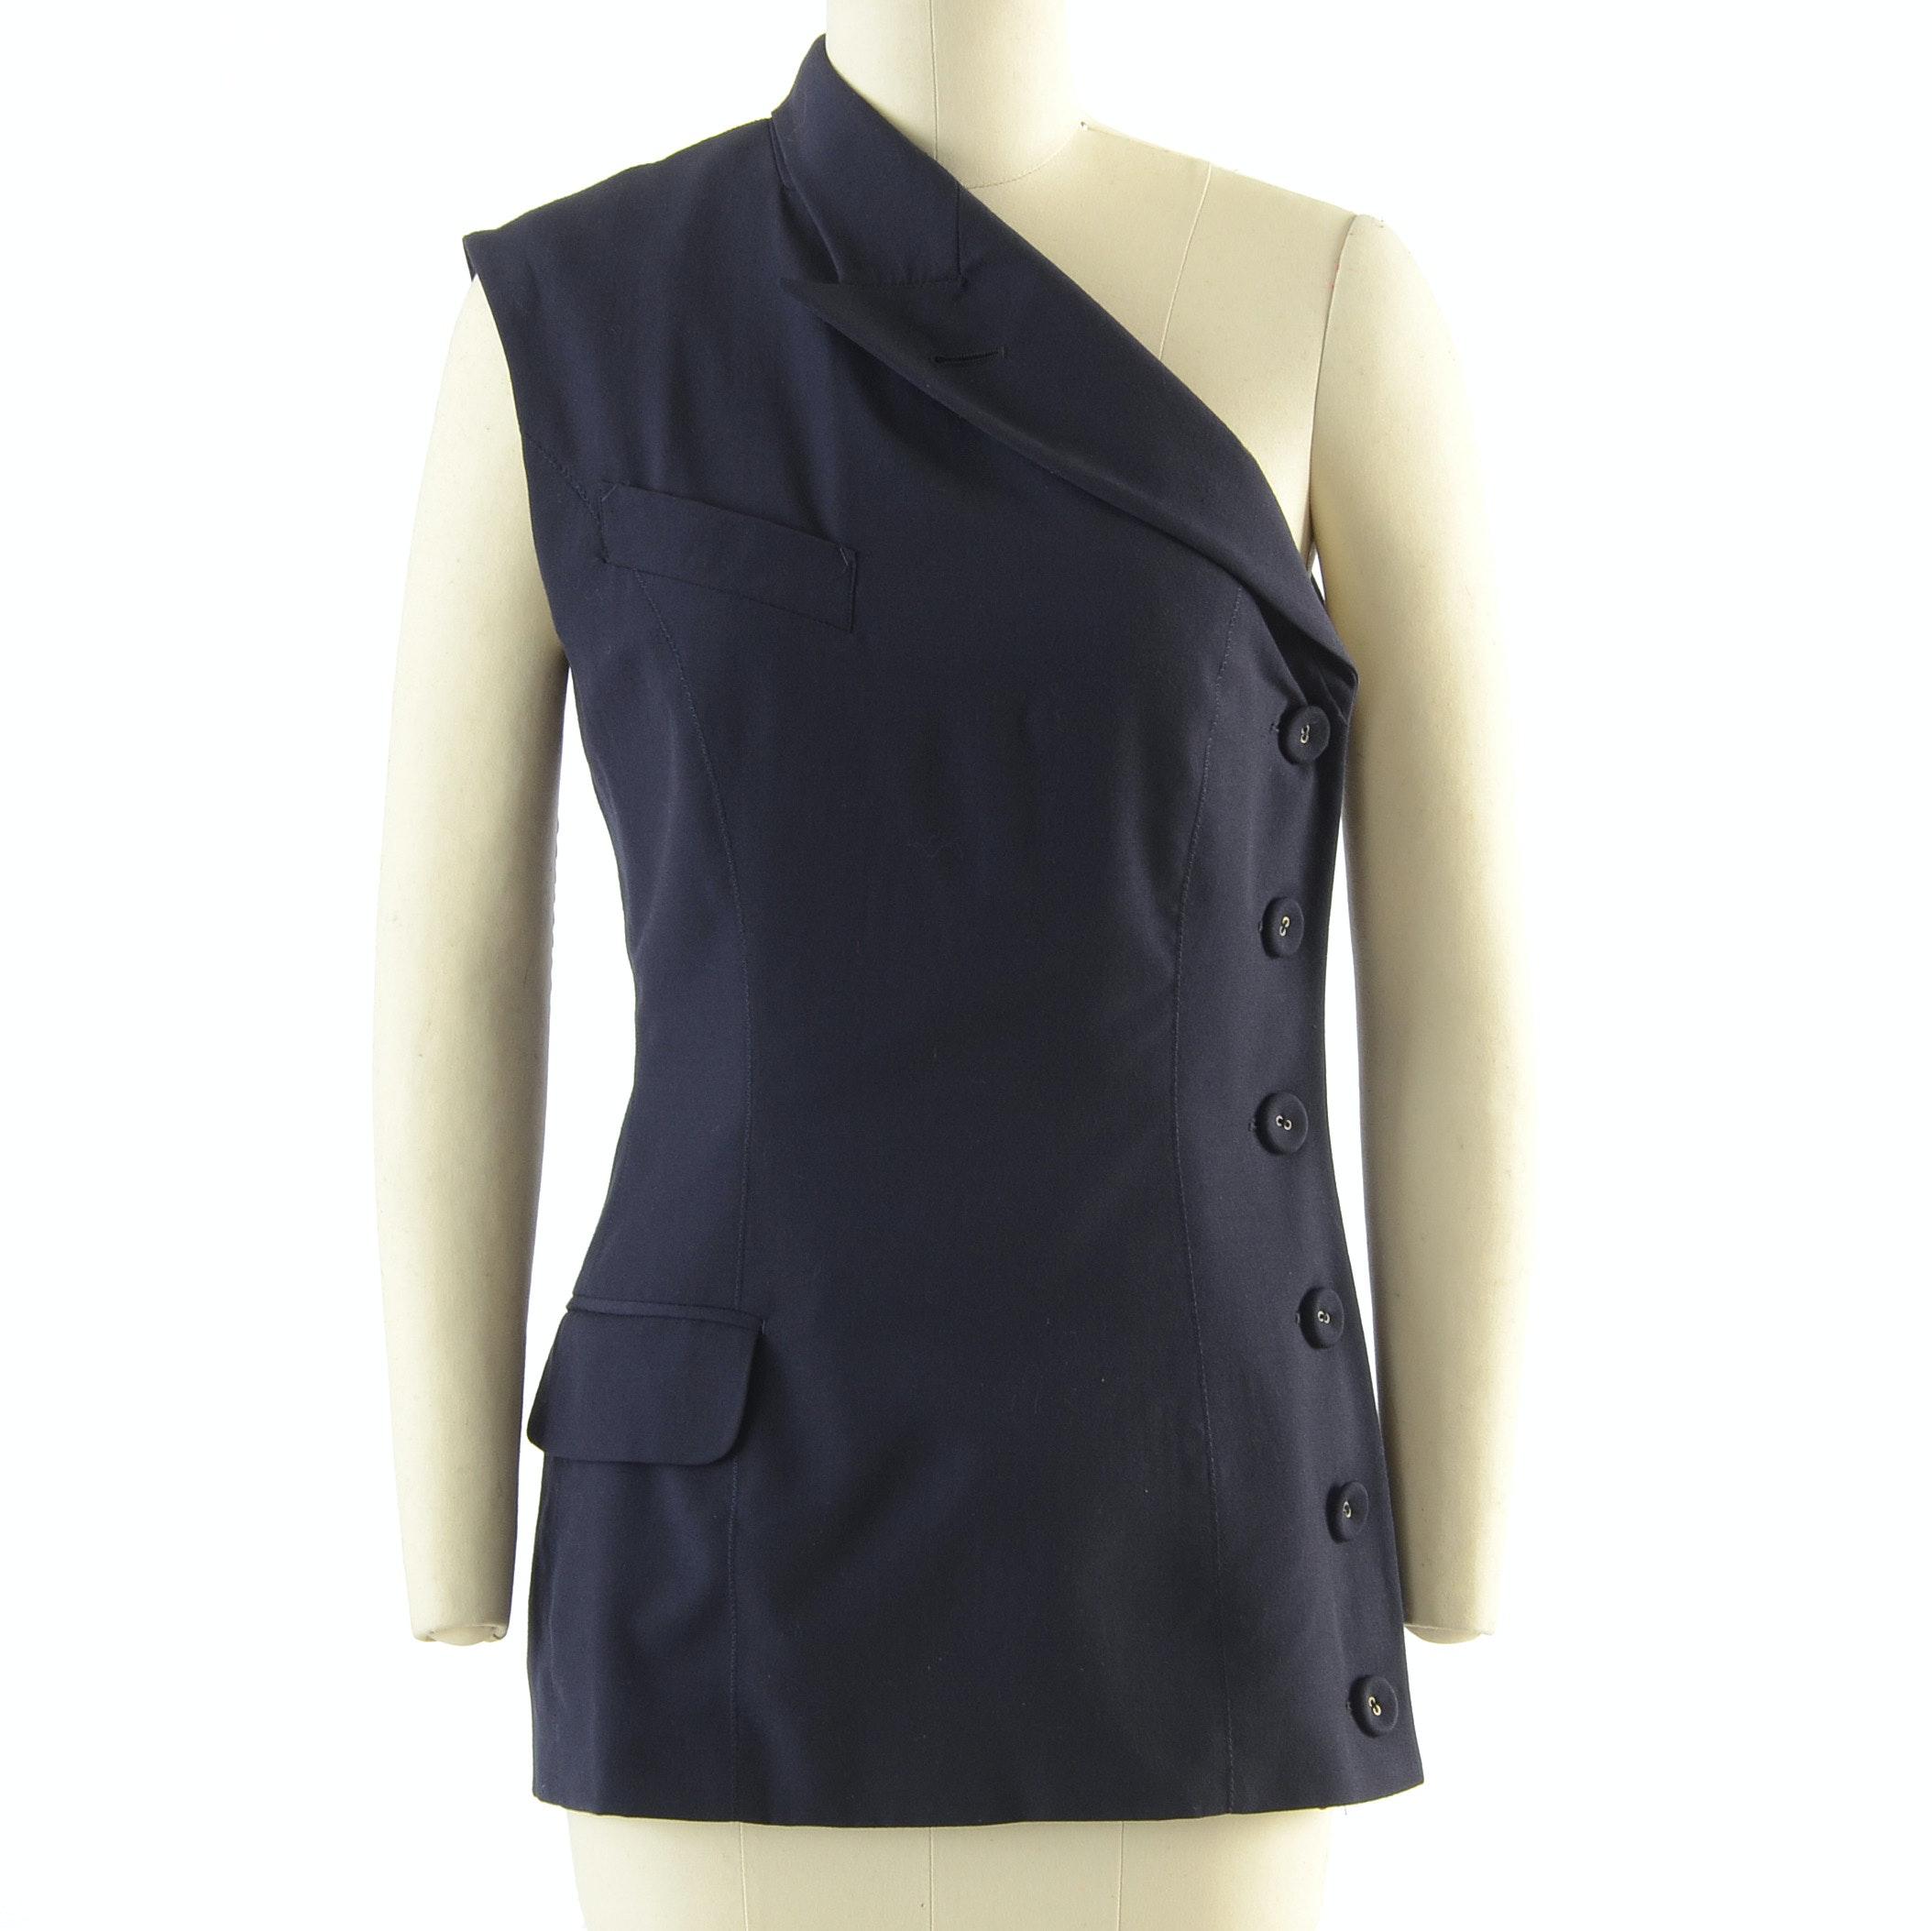 Jean Paul Gaultier Femme Navy Blue Gabardine Wool One-Shoulder Sleeveless Blazer with Side Buttons